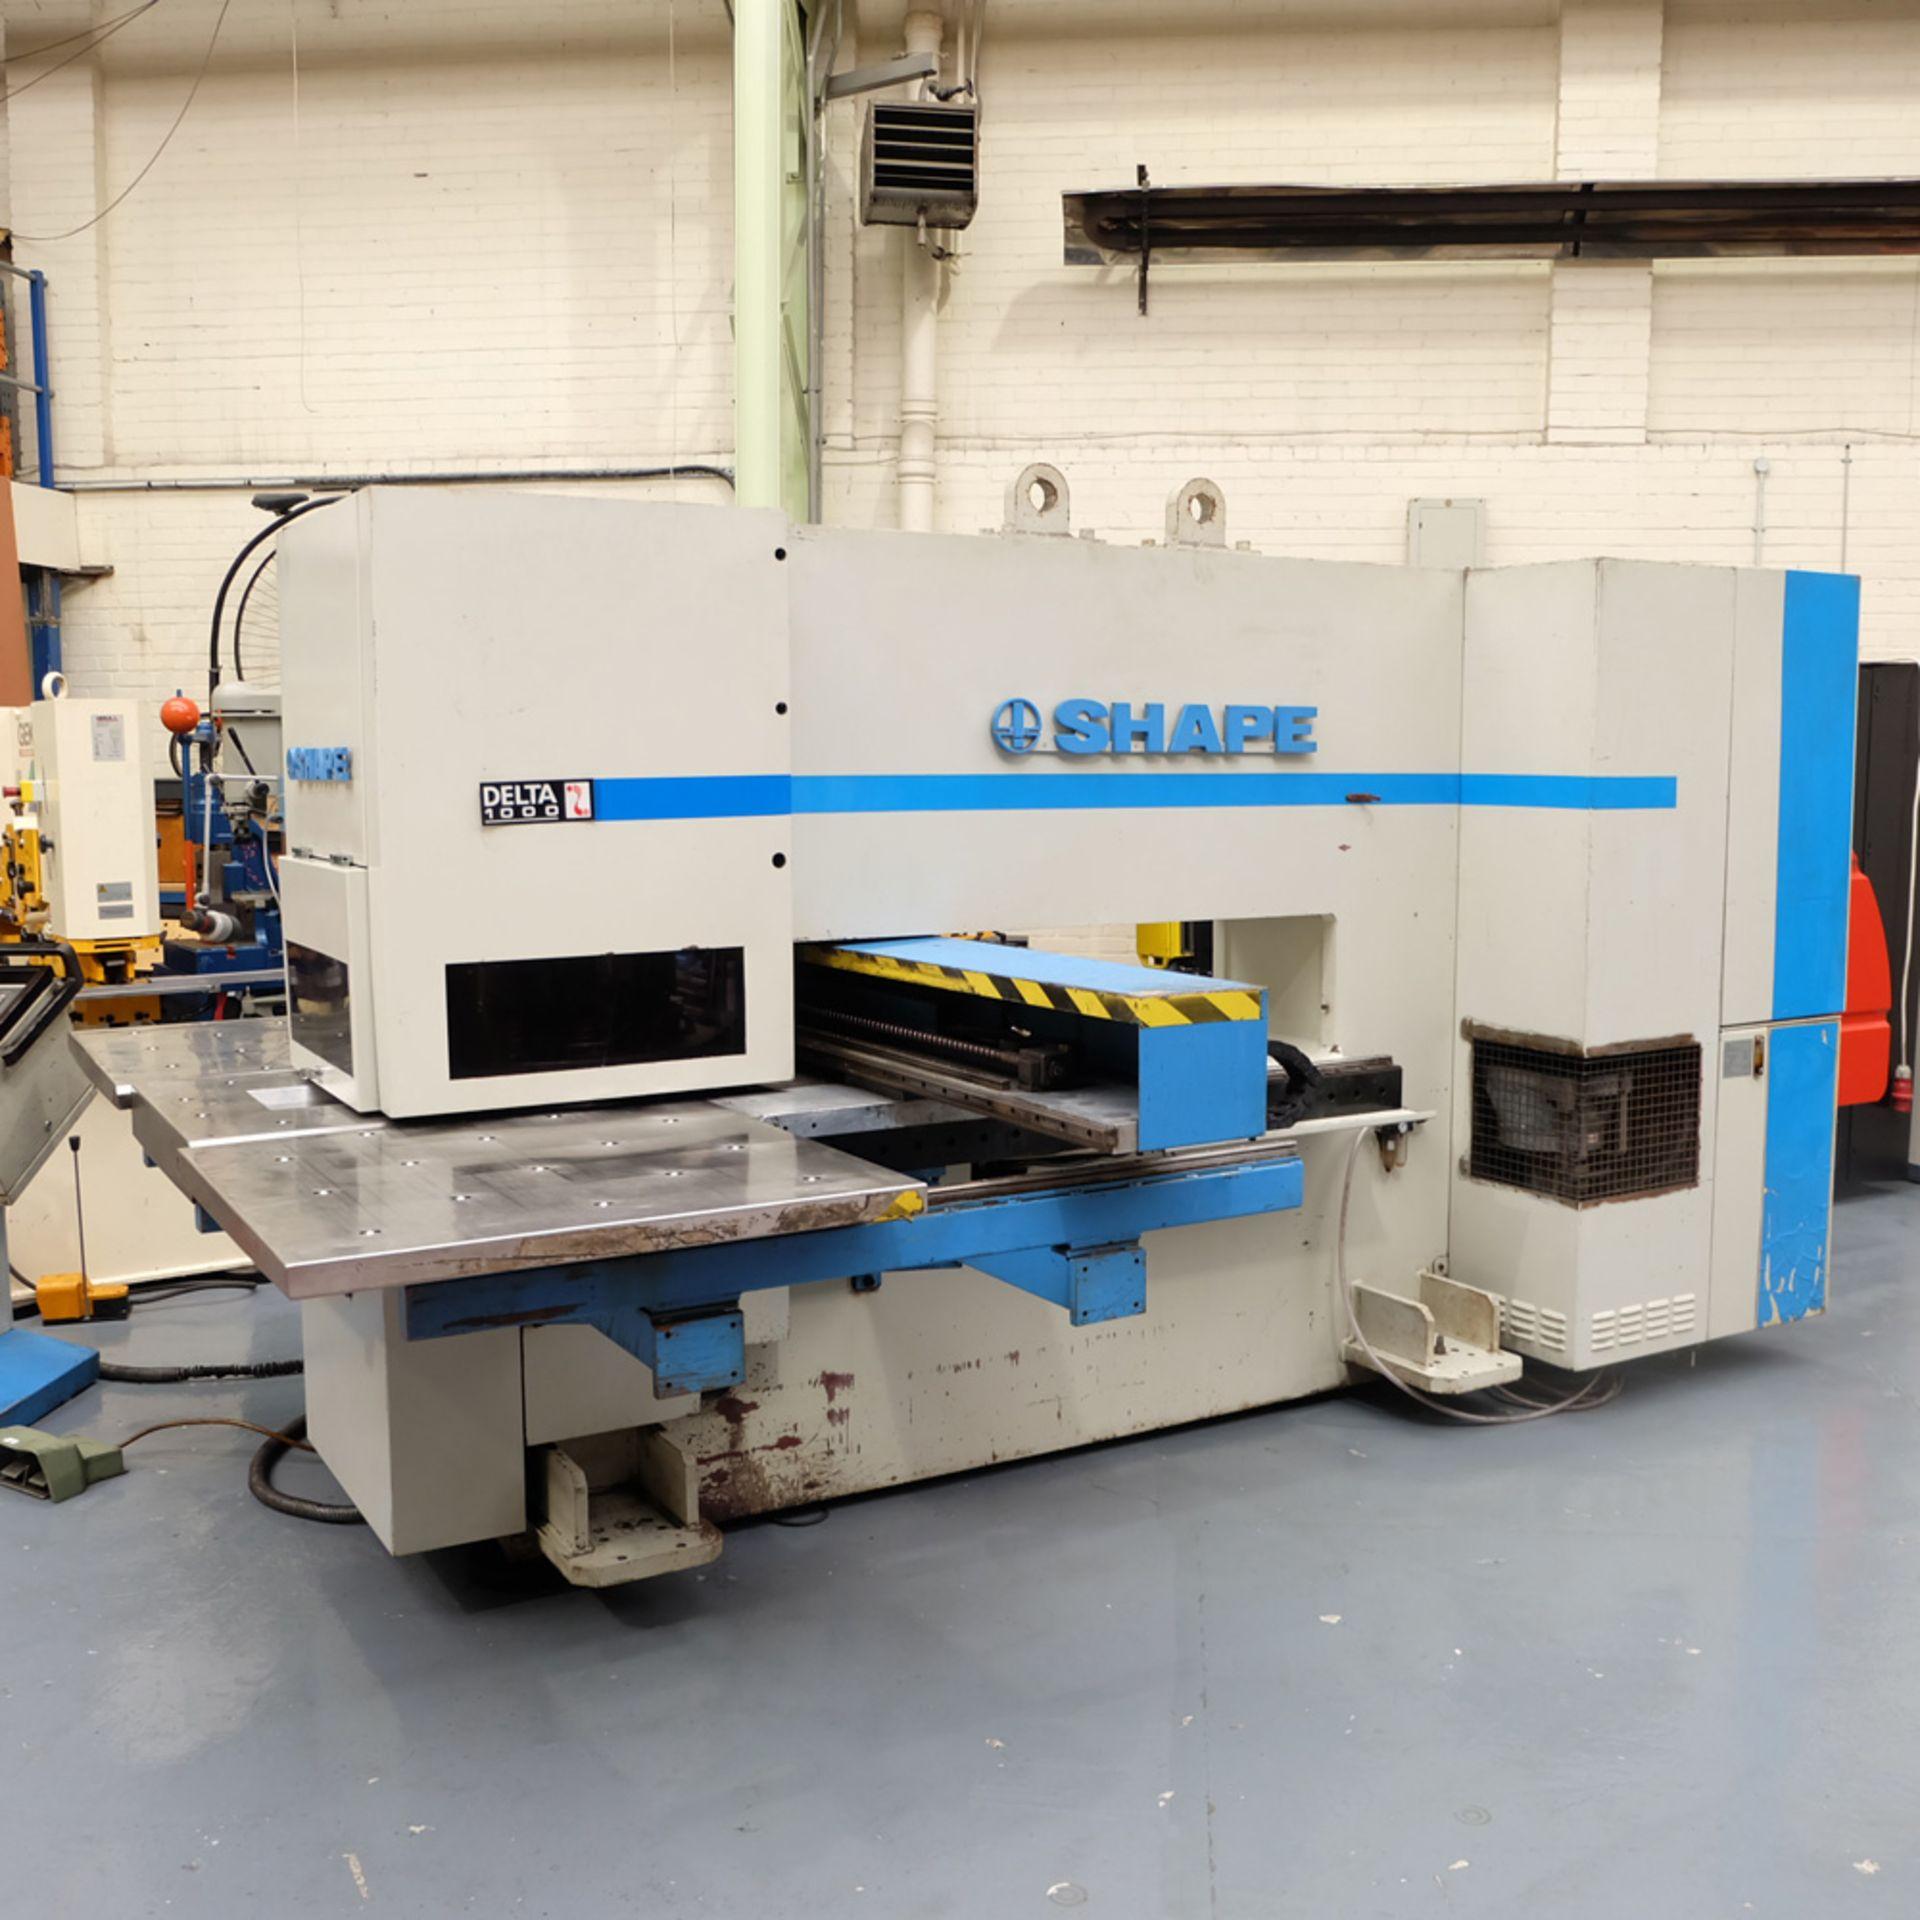 LVD Shape Delta 1000 Thick CNC Turret Punching Machine. - Image 4 of 18